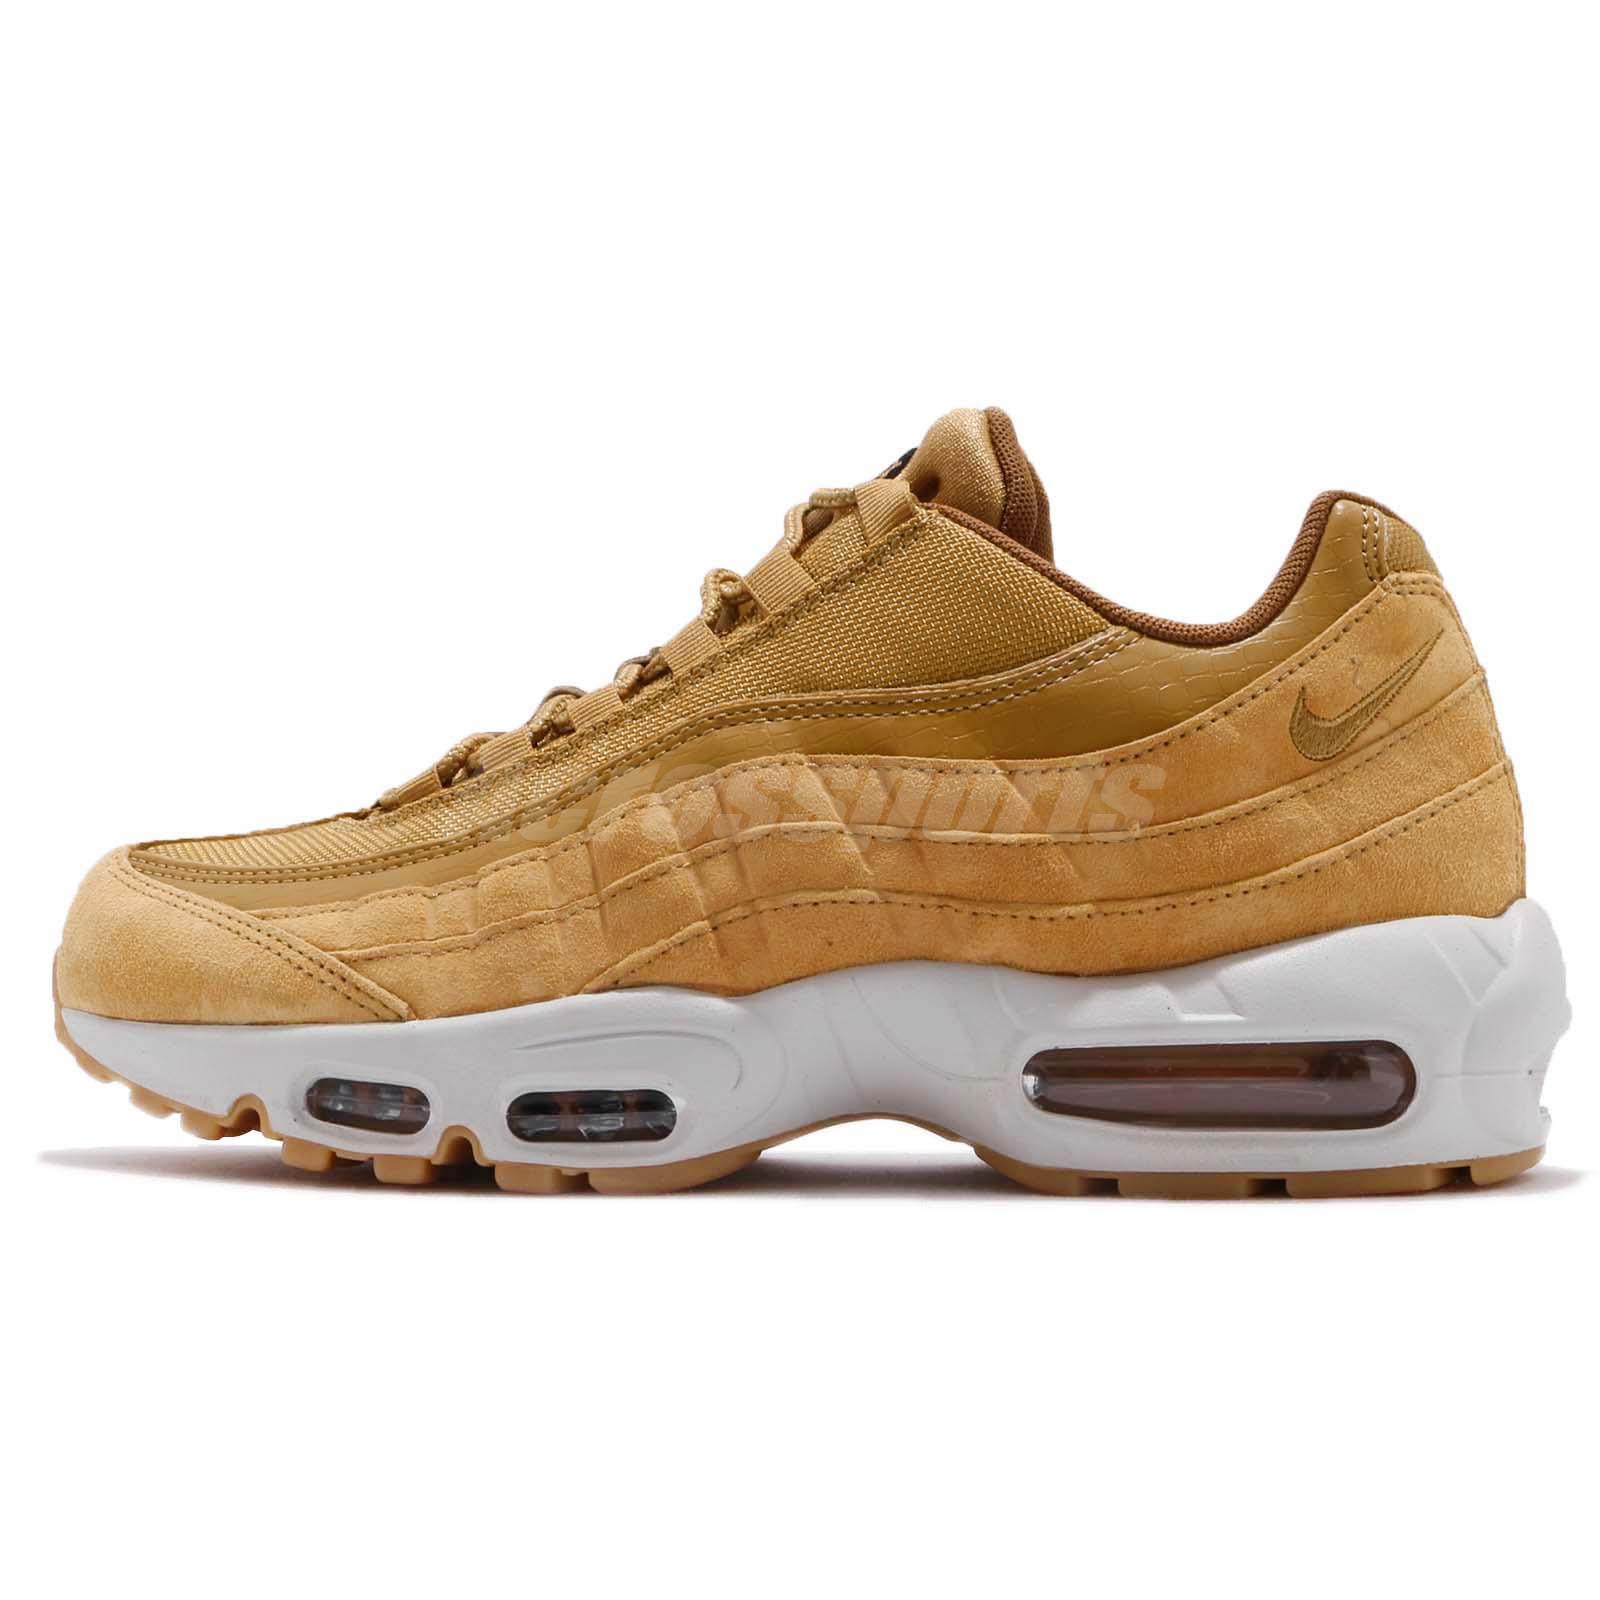 release date: 624f8 45430 Nike Air Max 95 SE Wheat Pack Light Bone Men Running Shoes Sneakers AJ2018- 700